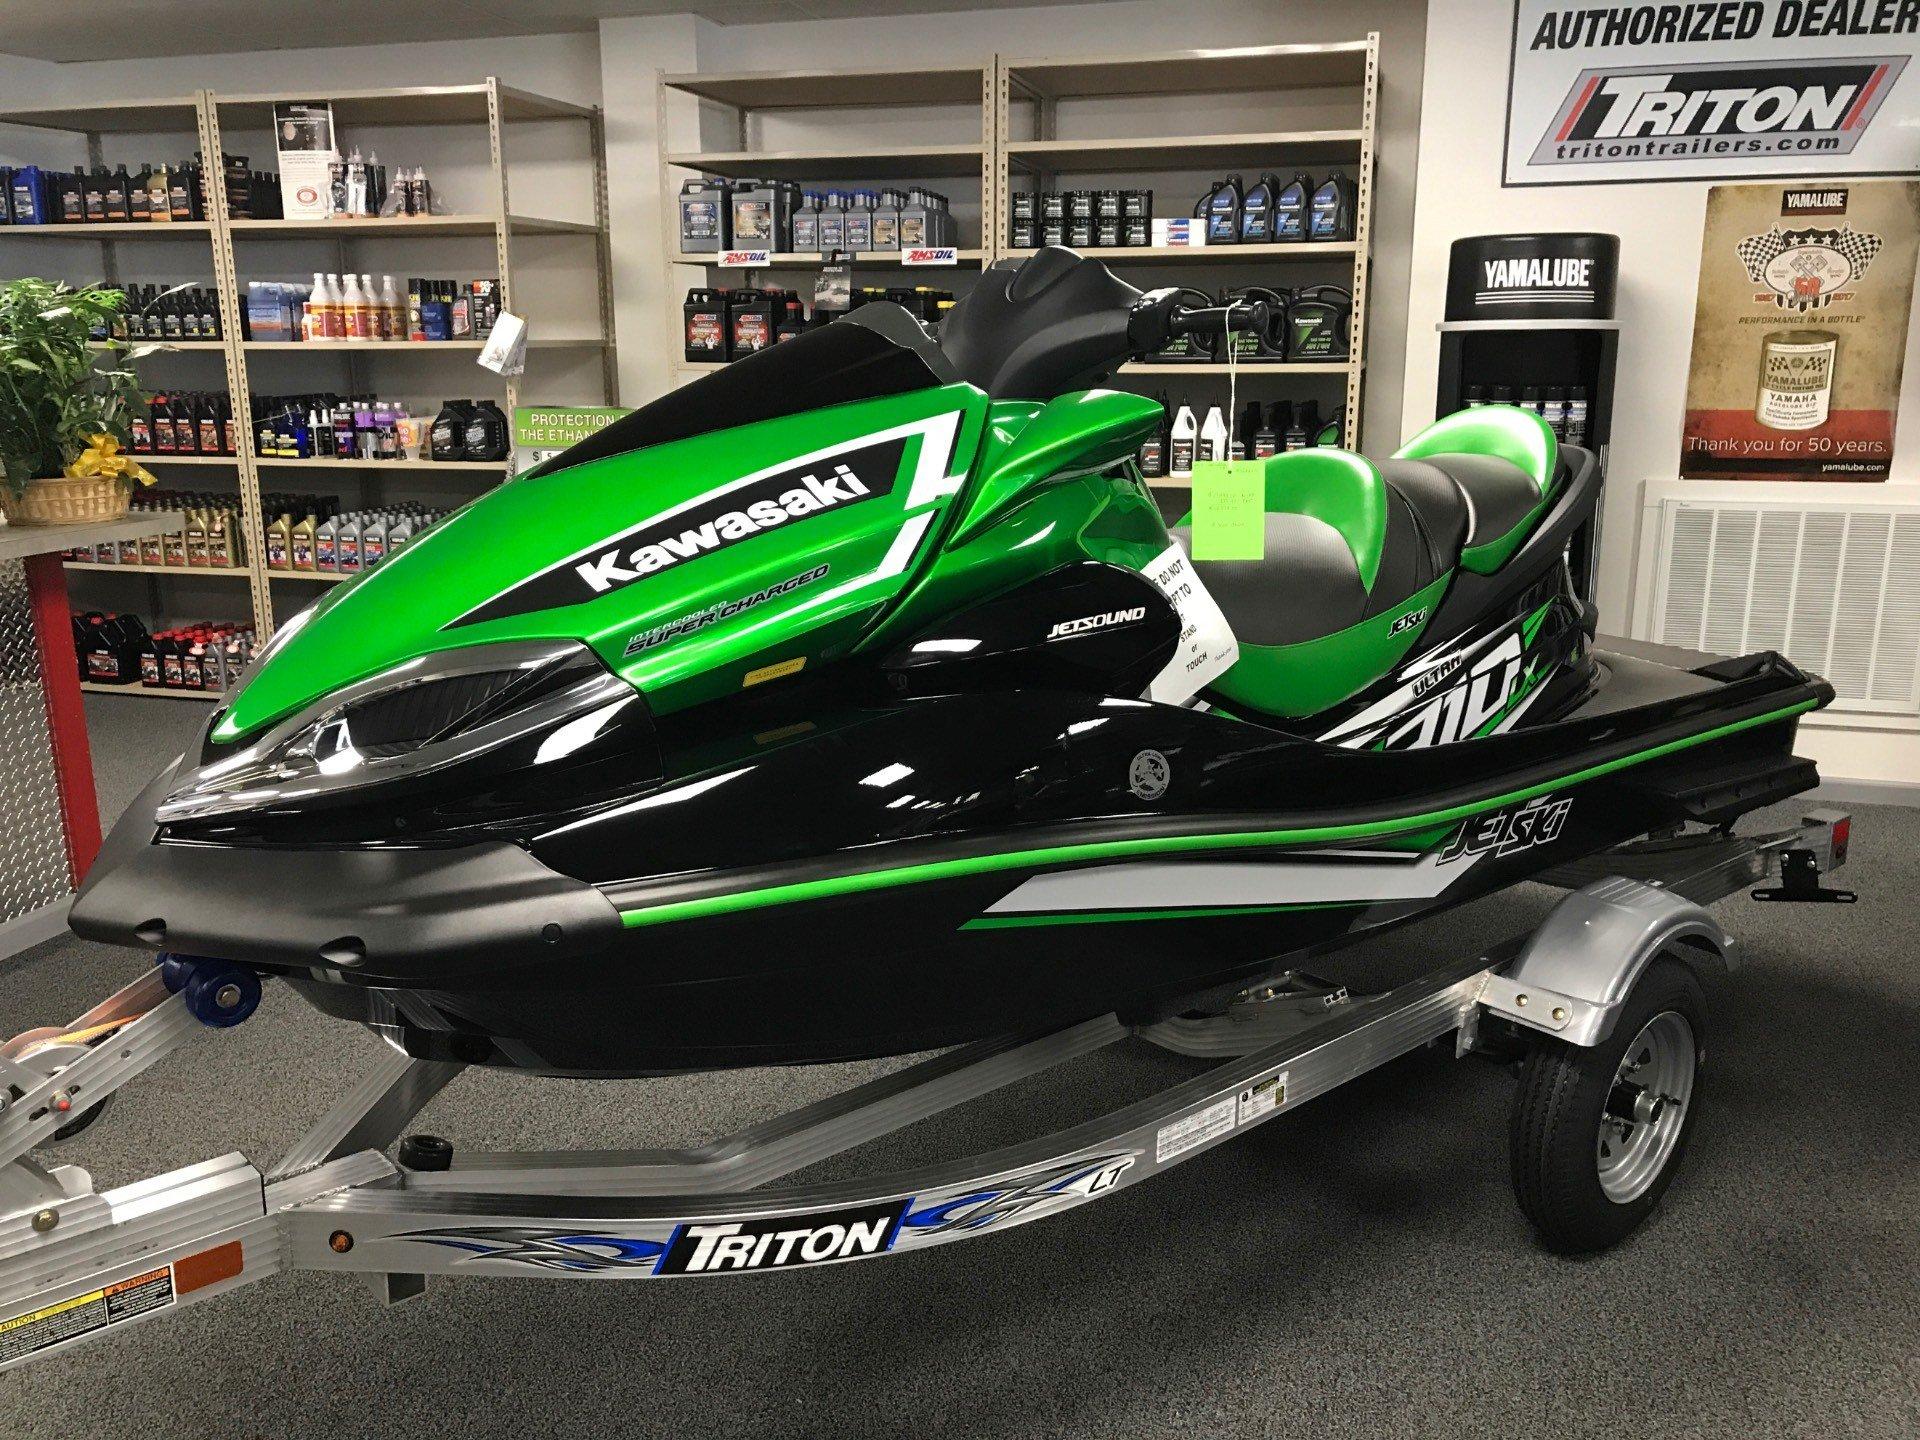 2017 Kawasaki Jet Ski Ultra 310LX for sale 3988